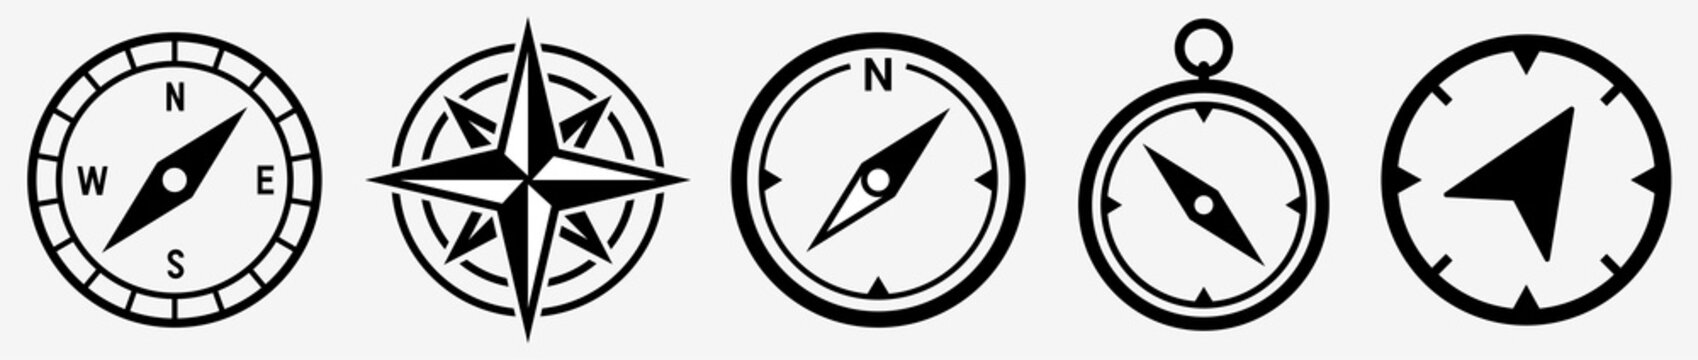 Compass icon set. Compass symbol. Vector